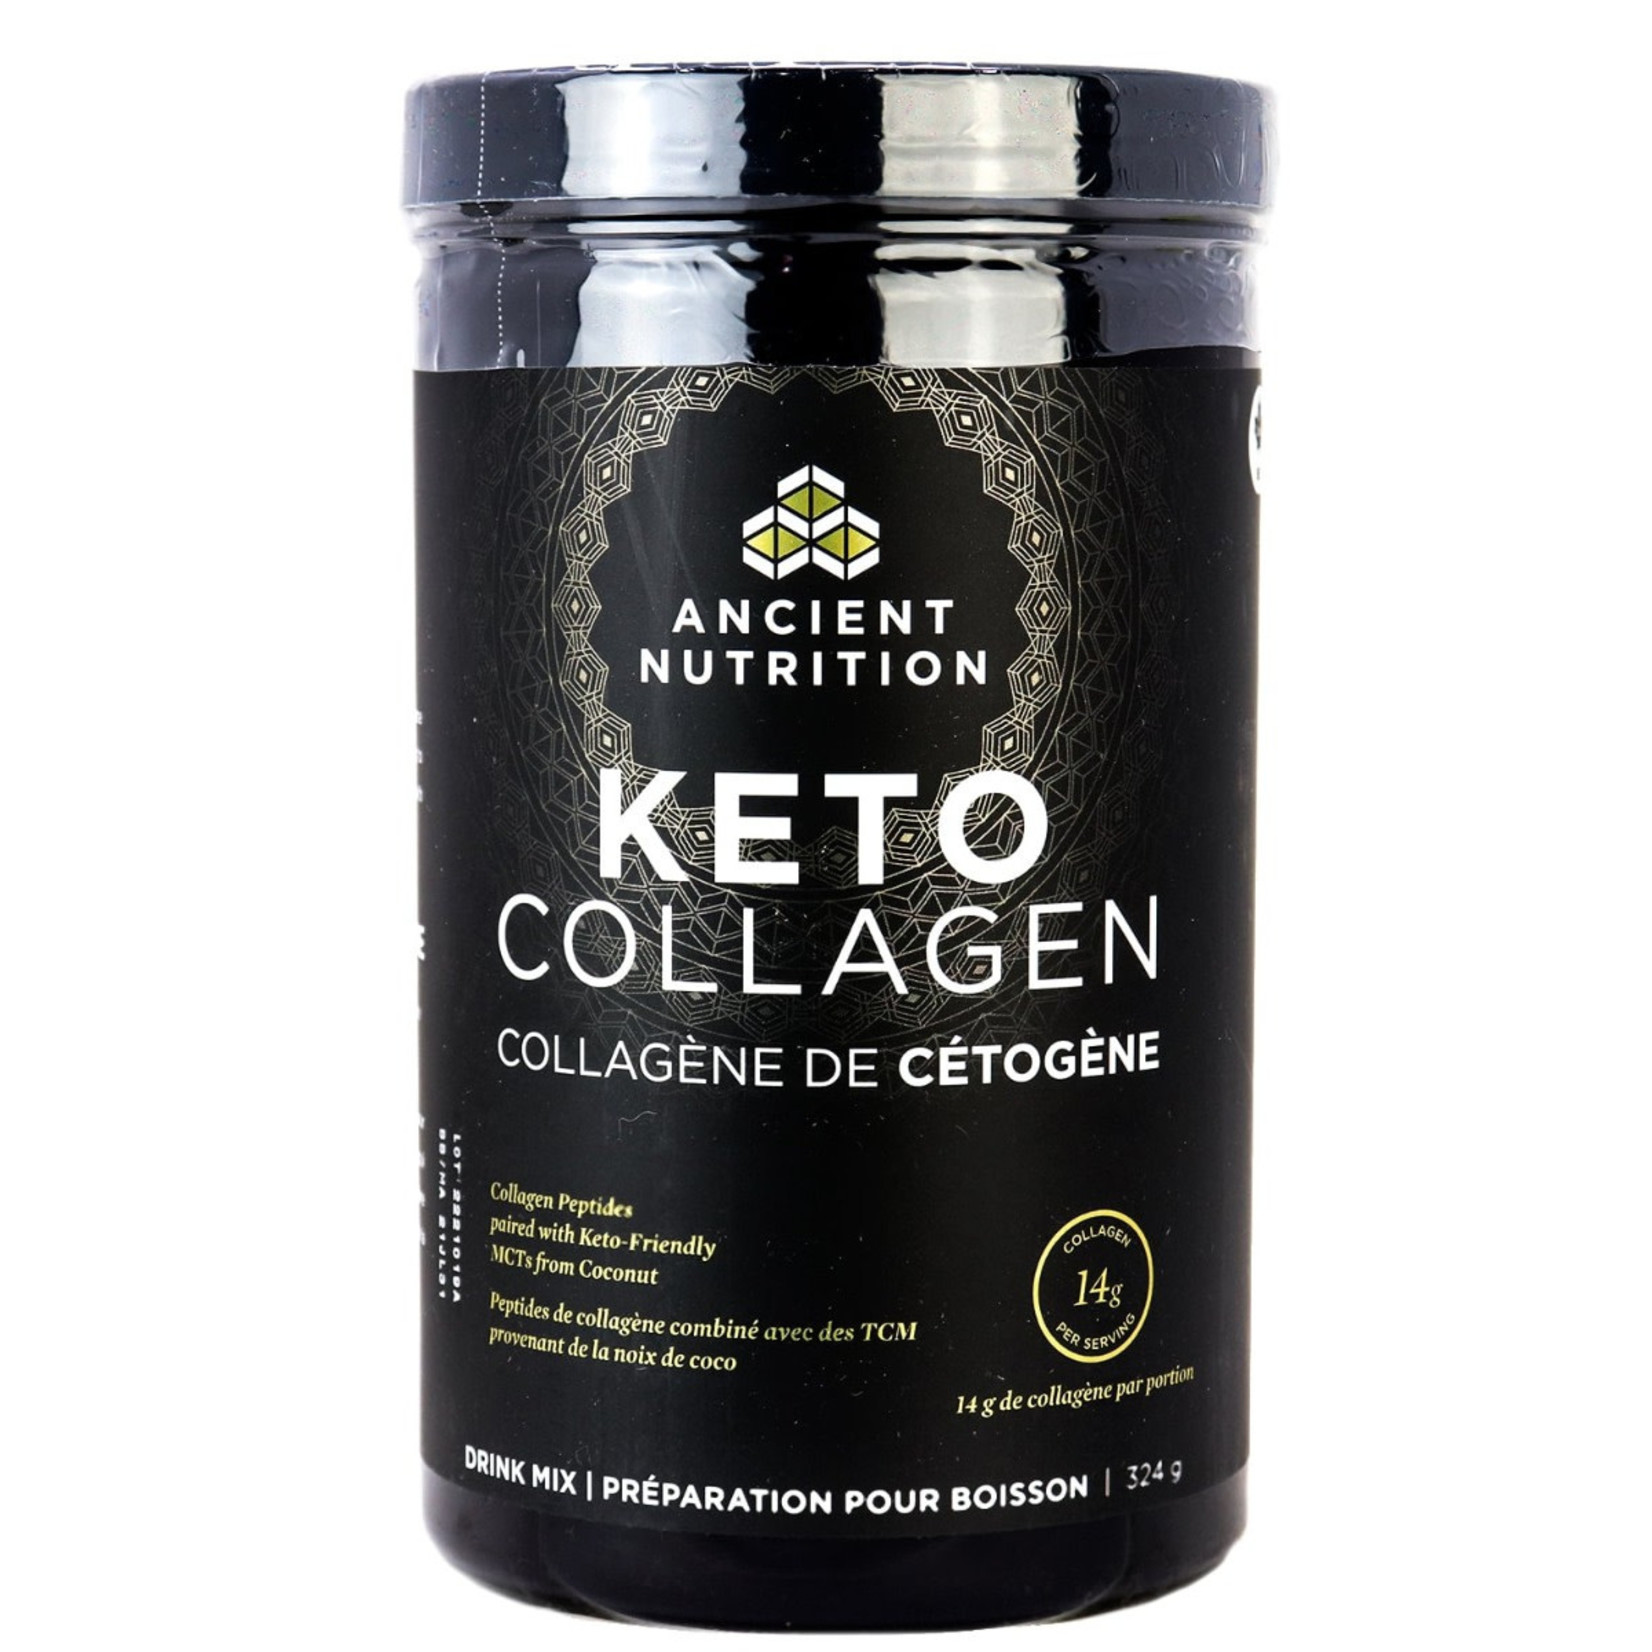 Ancient Nutrition Ancient Keto Collagen Pure 324g